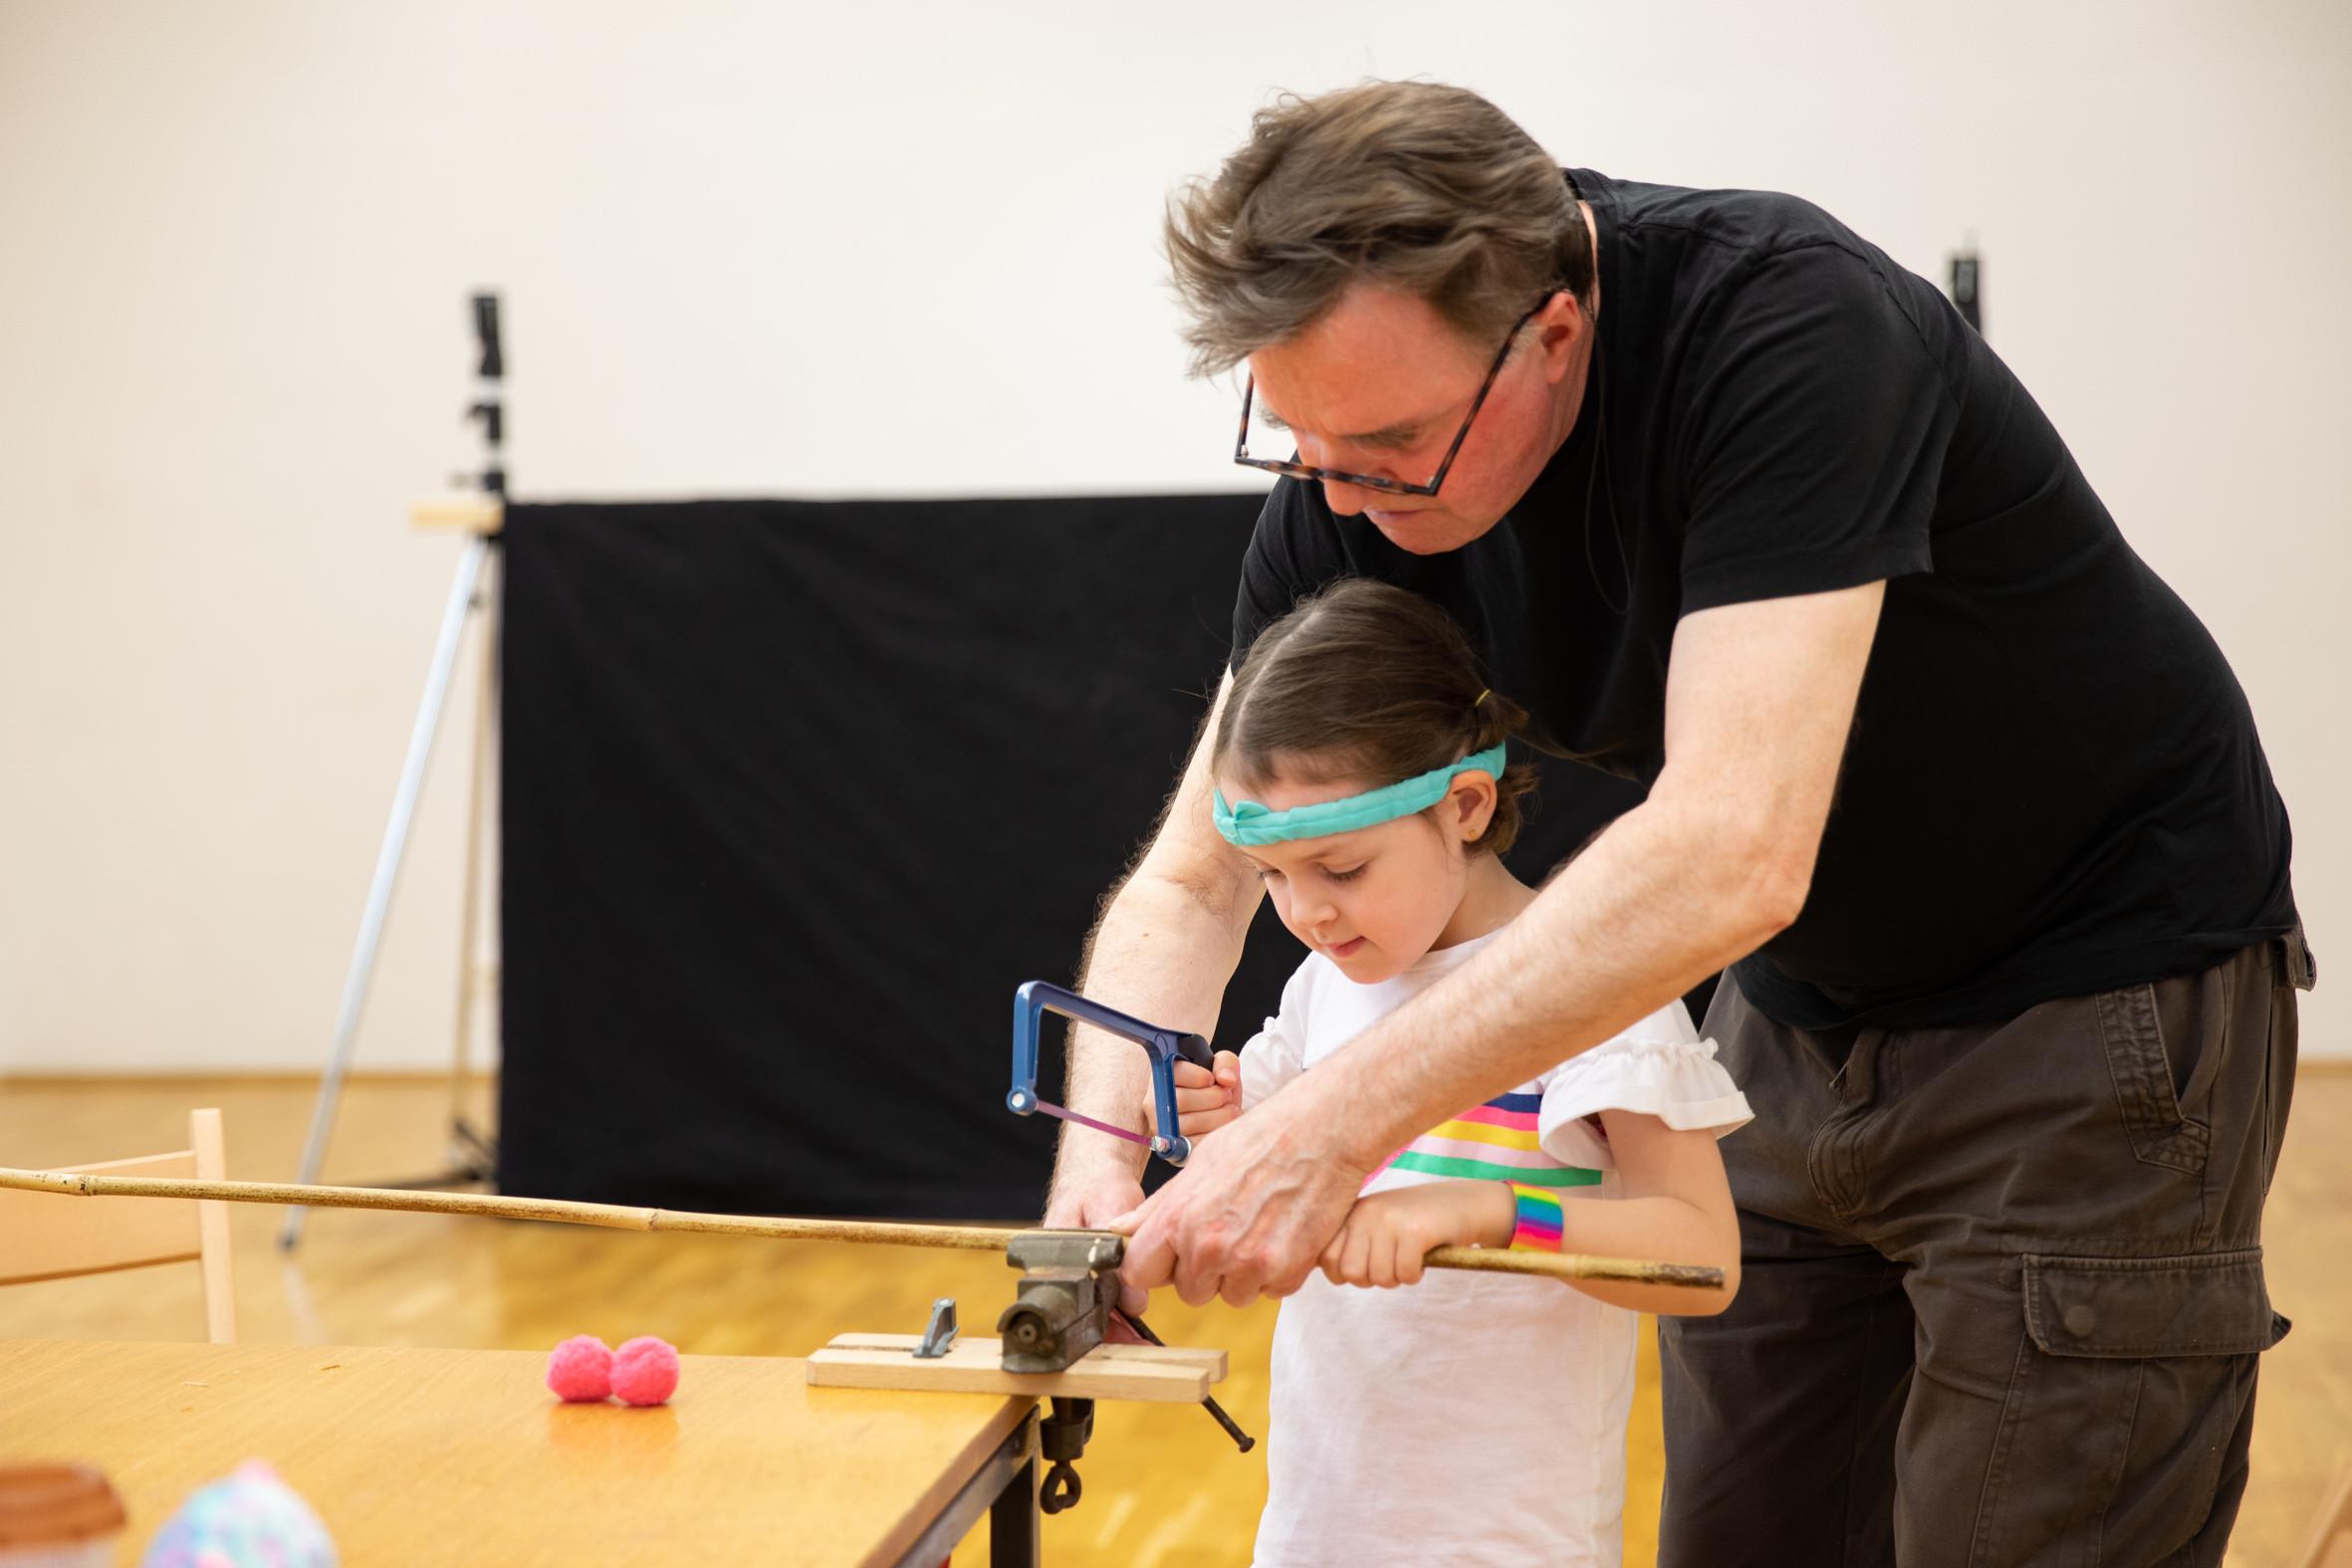 foto.esel.at: KinderKulturParcours - Eine Reise durchs MuseumsQuartier (24.- 26.5.2019)